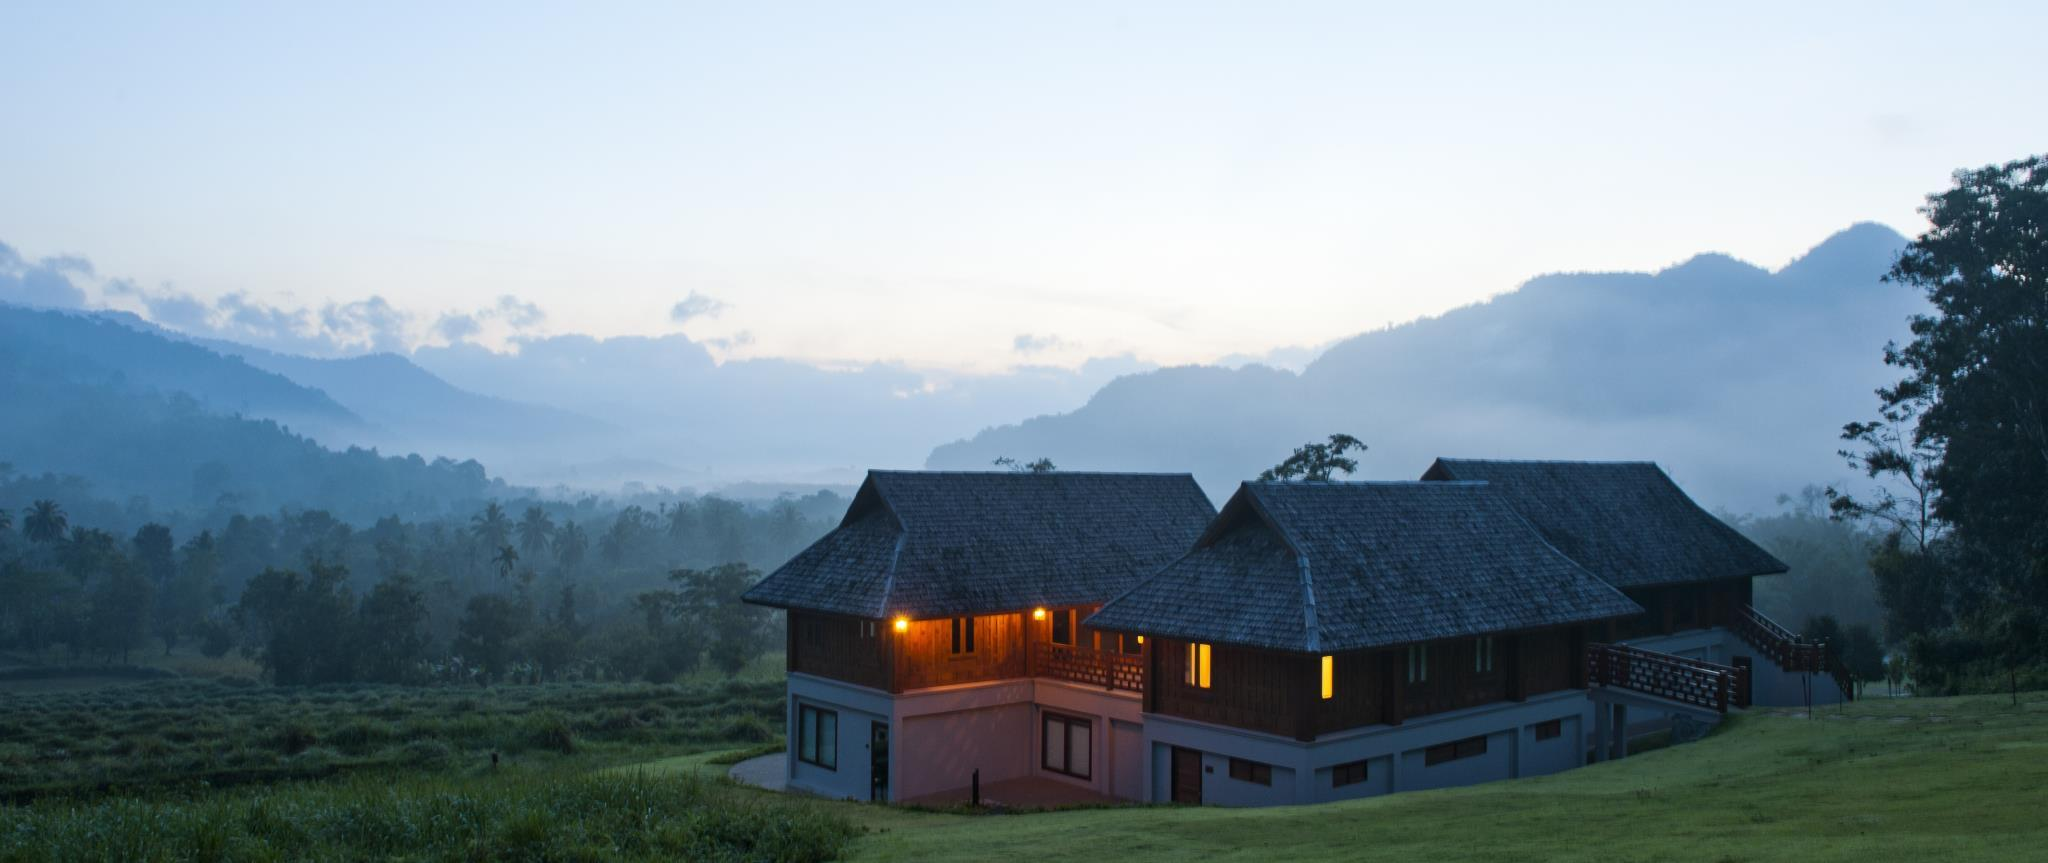 500 Rai Valley Retreat,500 ไร่ แวลเลย์ รีทรีต